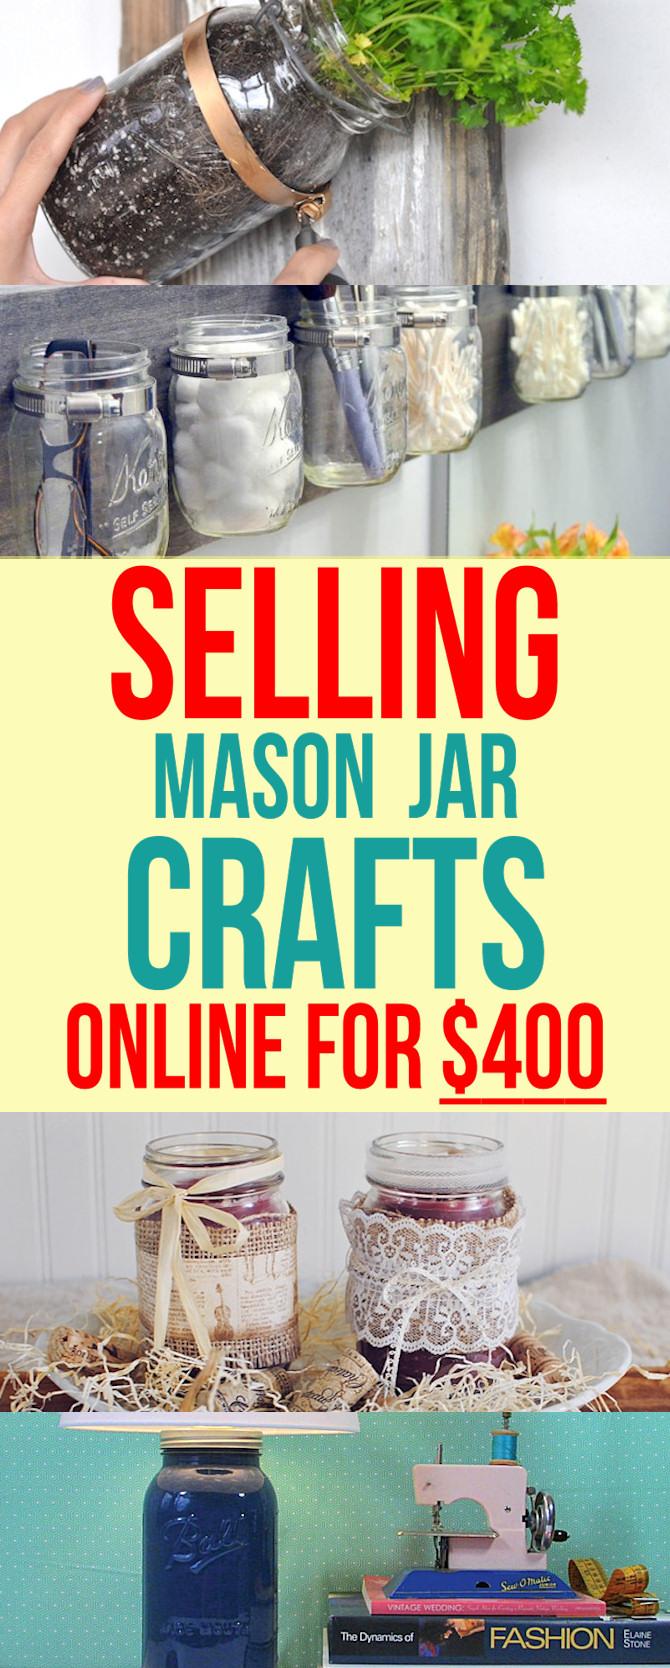 Sell Mason Jar Crafts